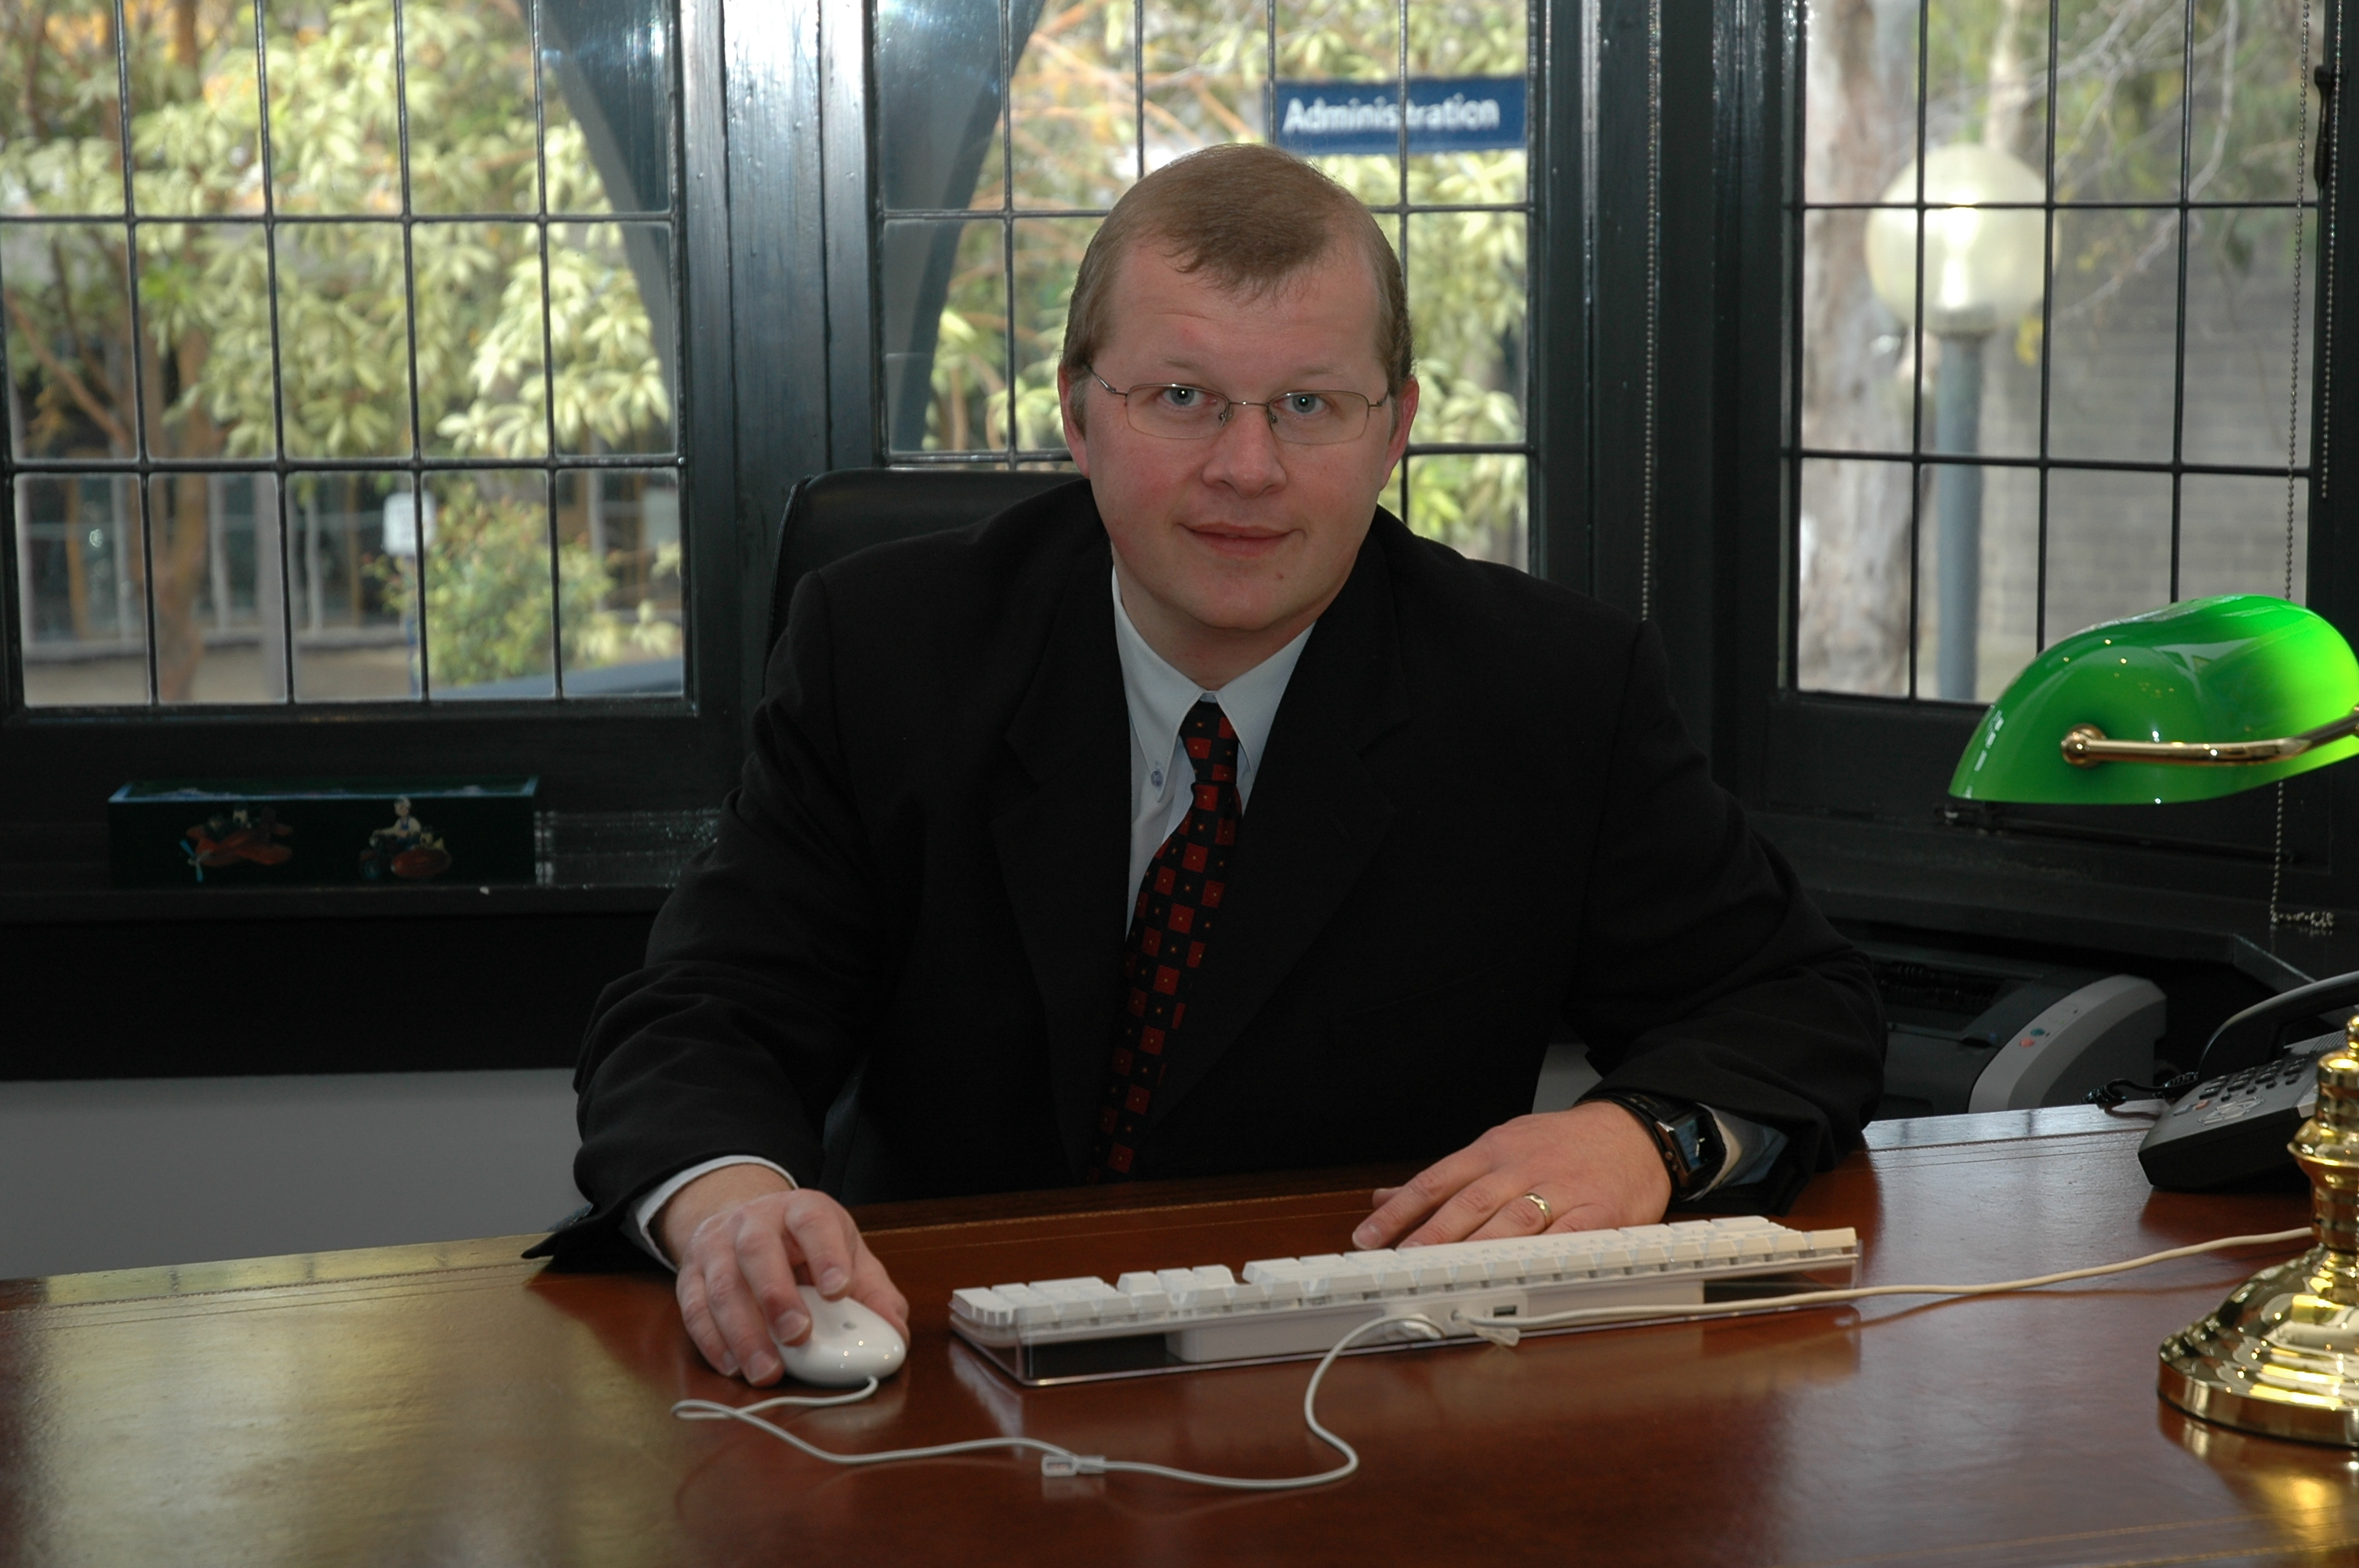 2006-Headmaster-Tim-Argall.jpg?mtime=20170810004825#asset:618